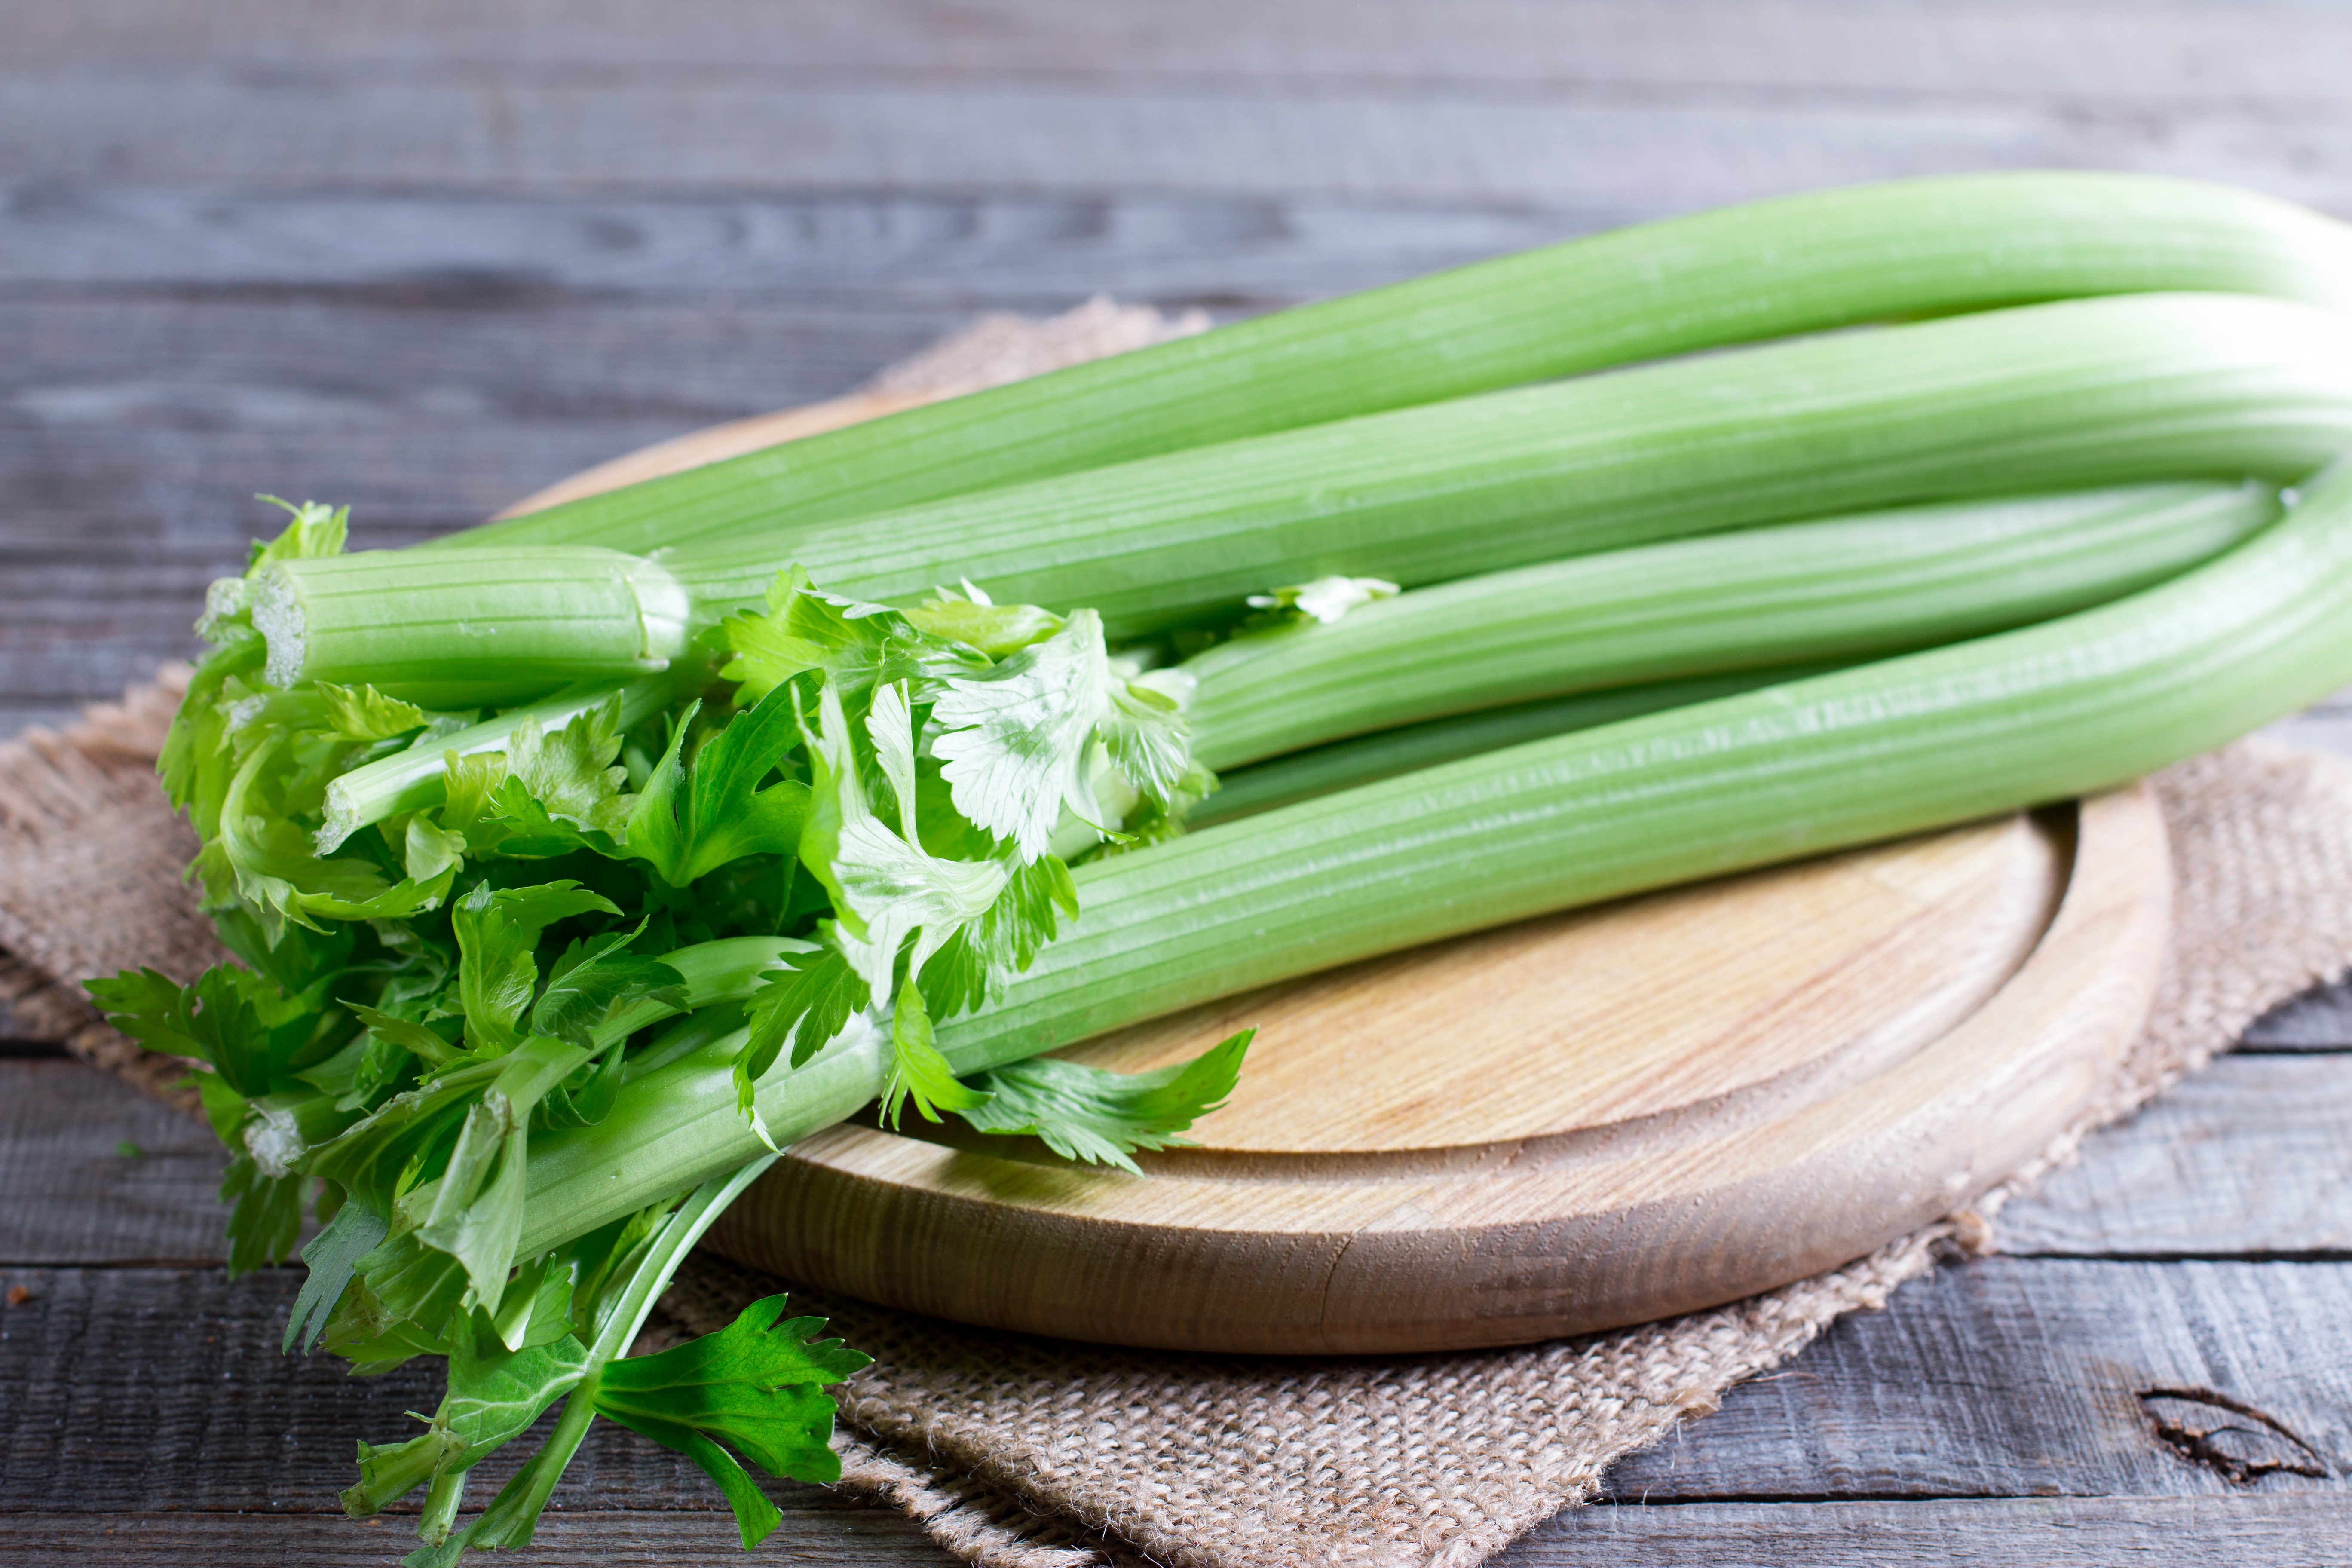 Is Celery Toxic? | Healthy Eating | SF Gate